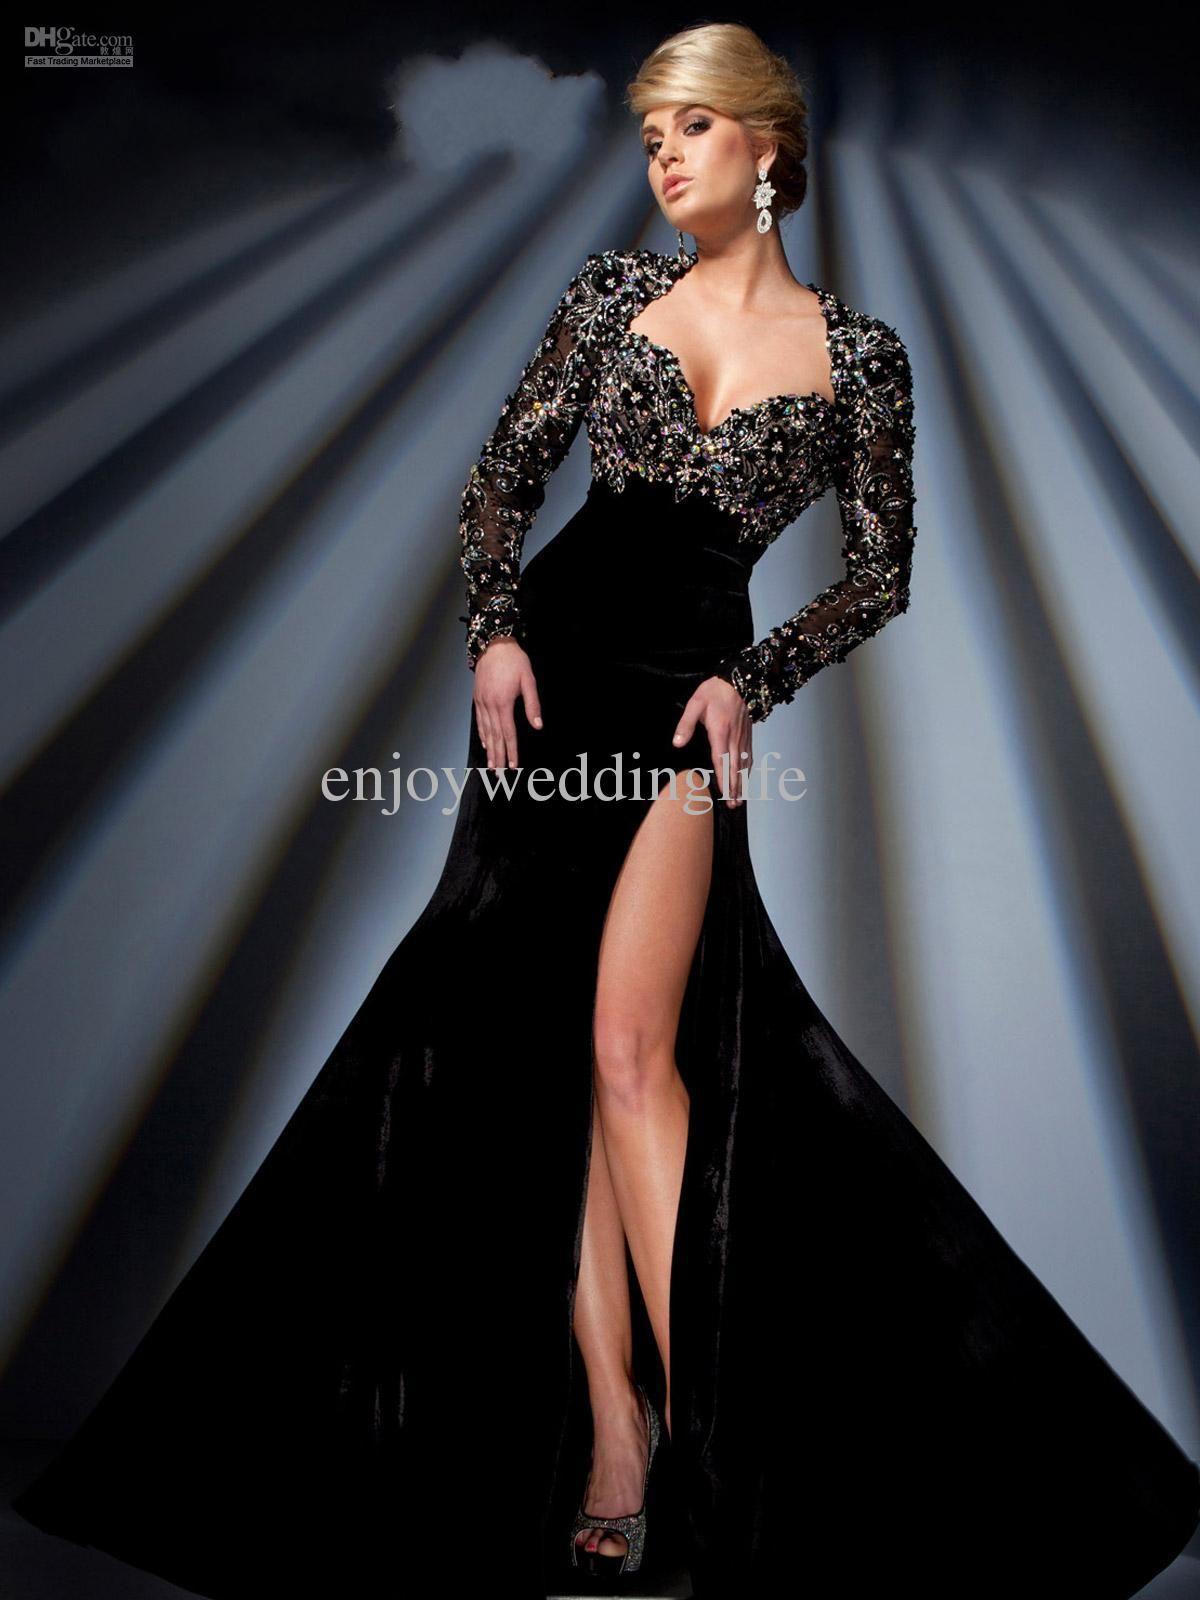 Cheap Prom Dresses Discount Sweetheart Black Velet Prom Dresses